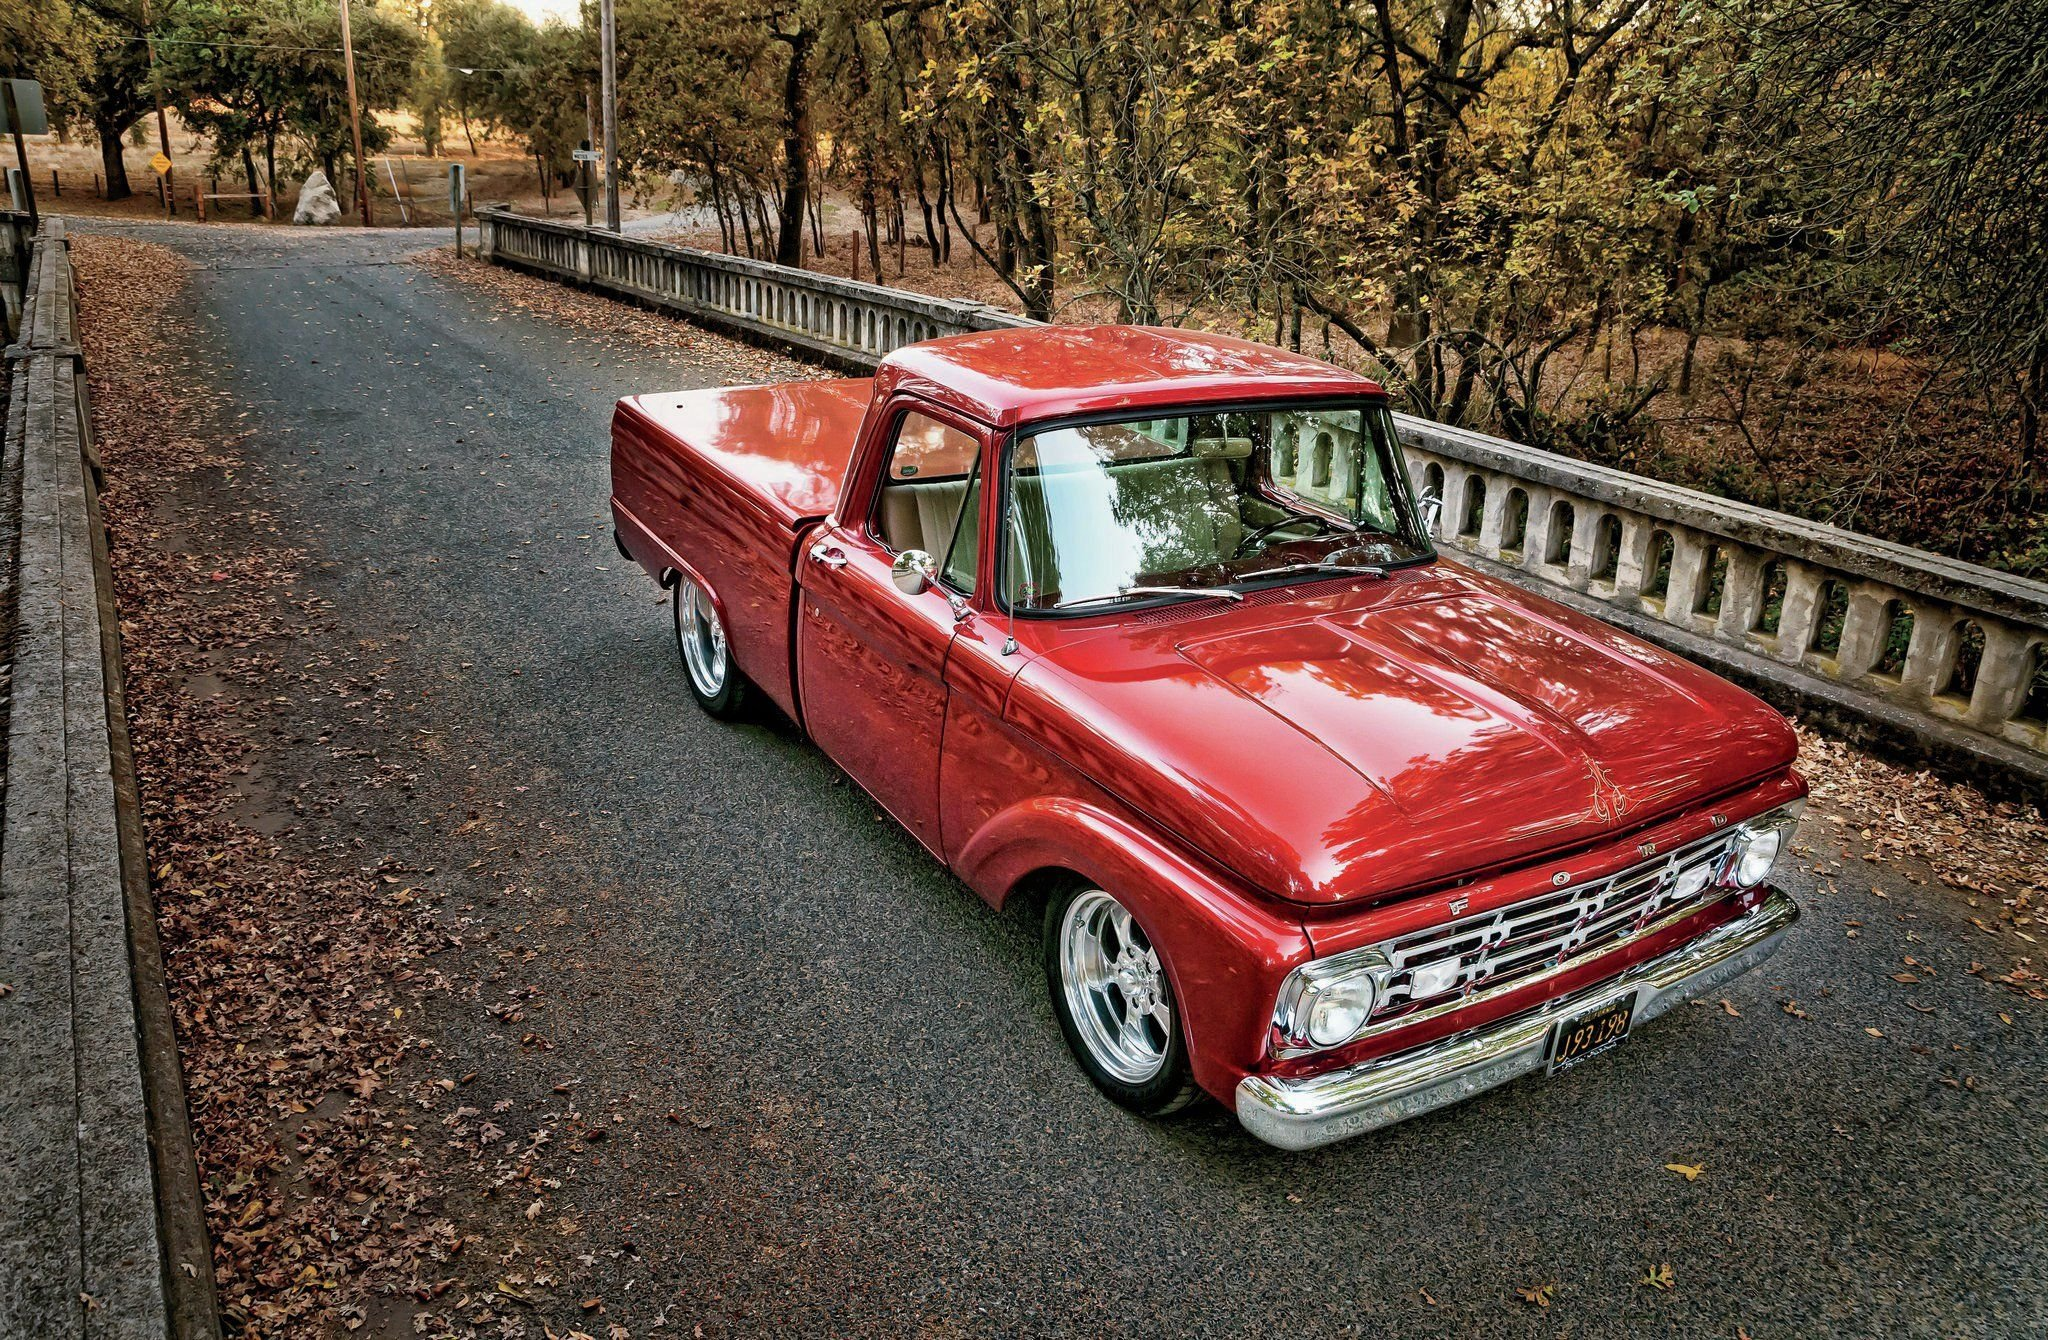 1964 Ford F-100 Pickup-03 wallpaper